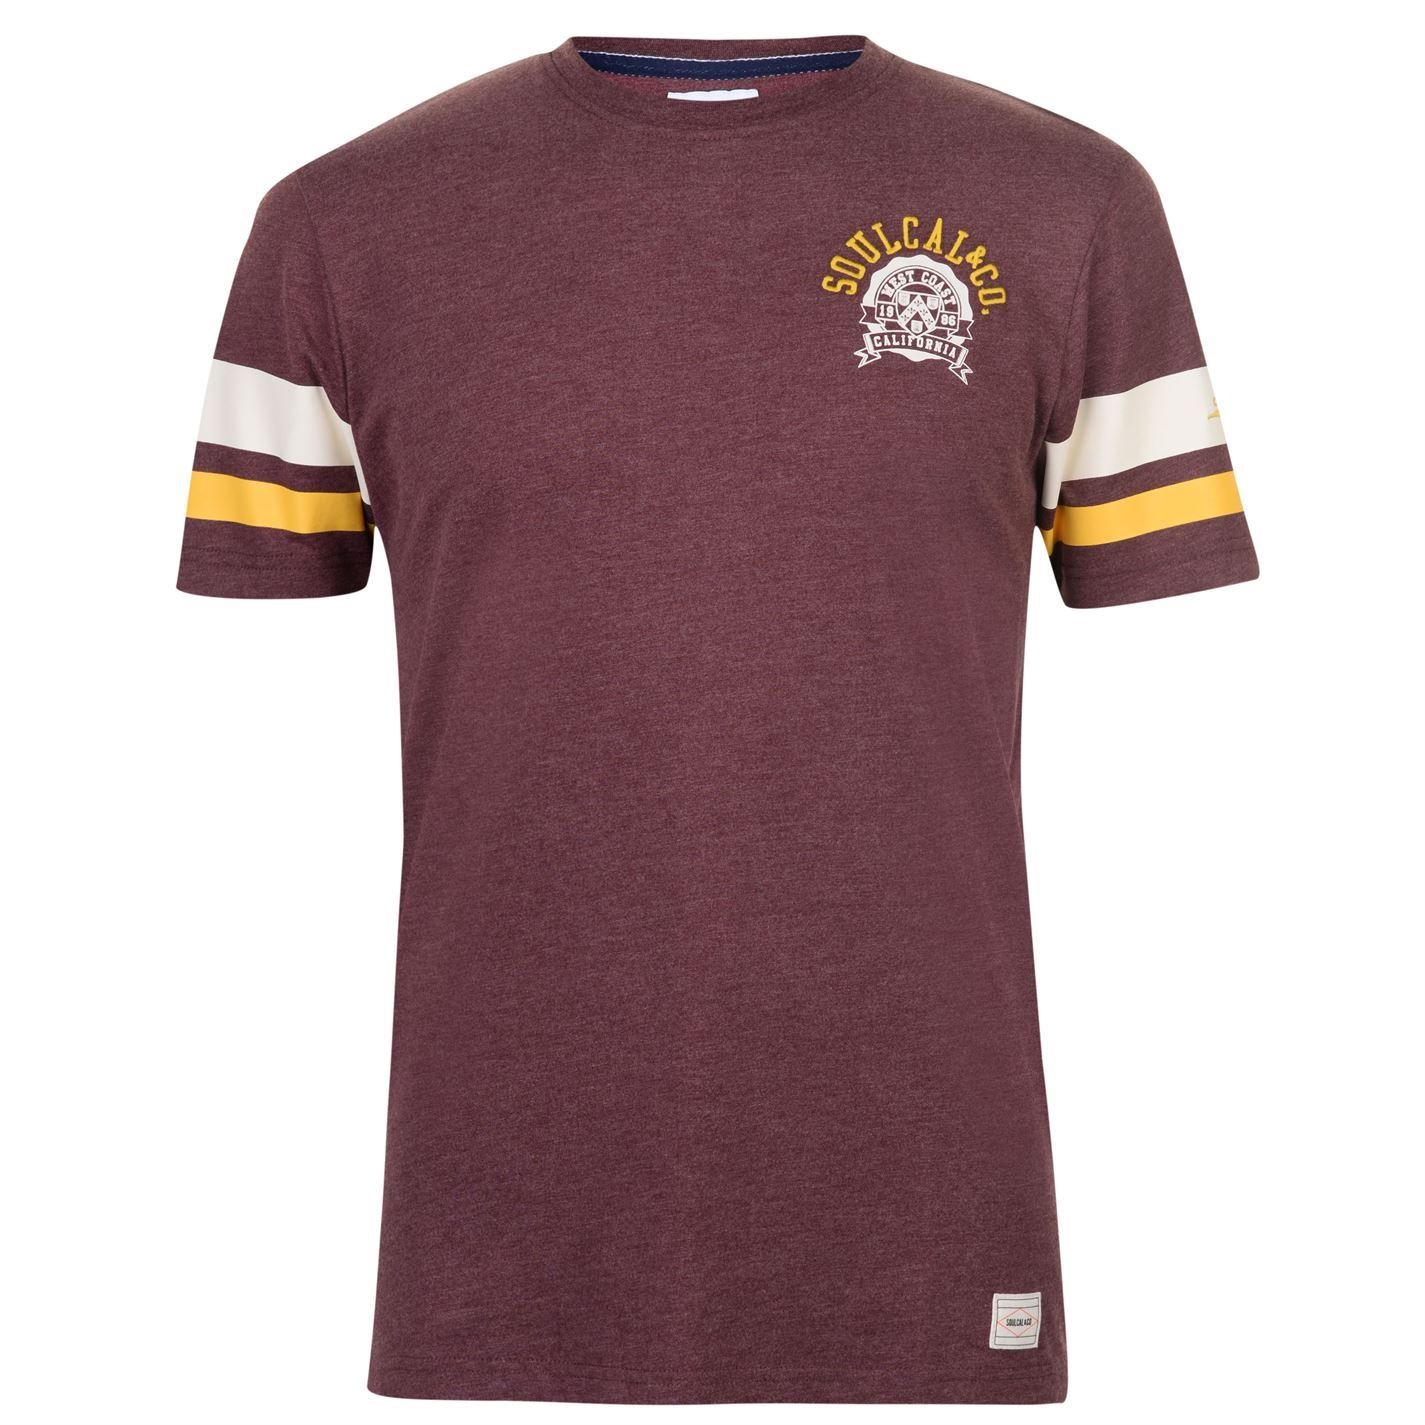 SoulCal Stripe Sleeve T-Shirt Mens Tee Shirt Top